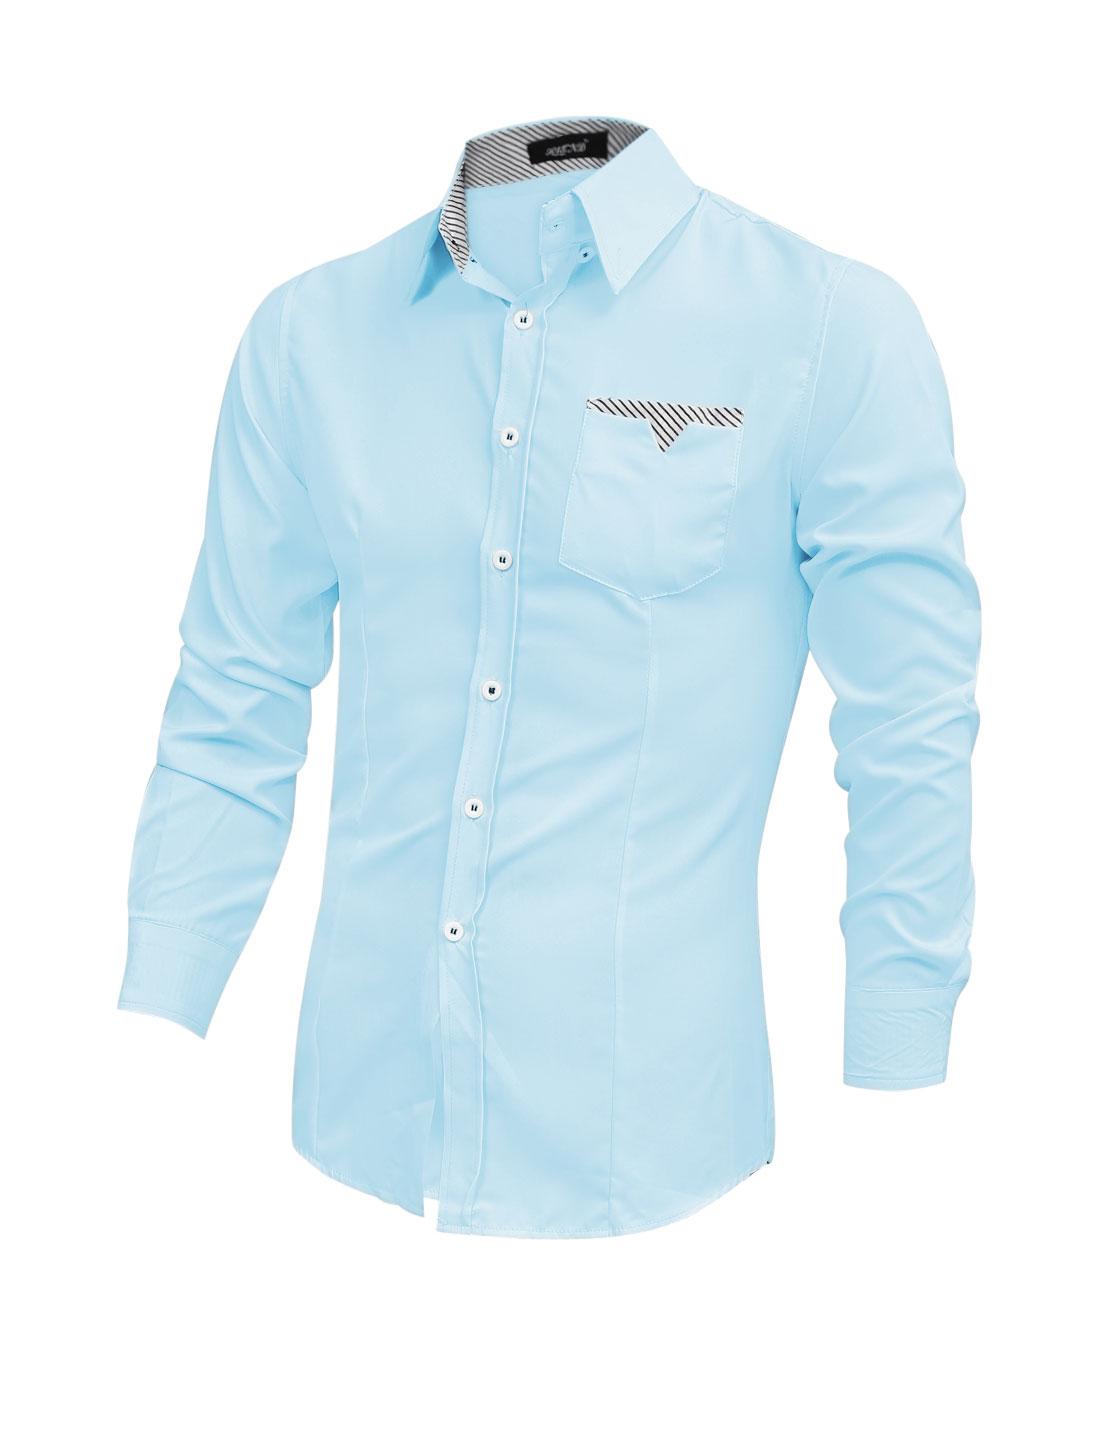 Men Long Sleeve Single Breasted Single Chest Pocket Shirt Light Blue M